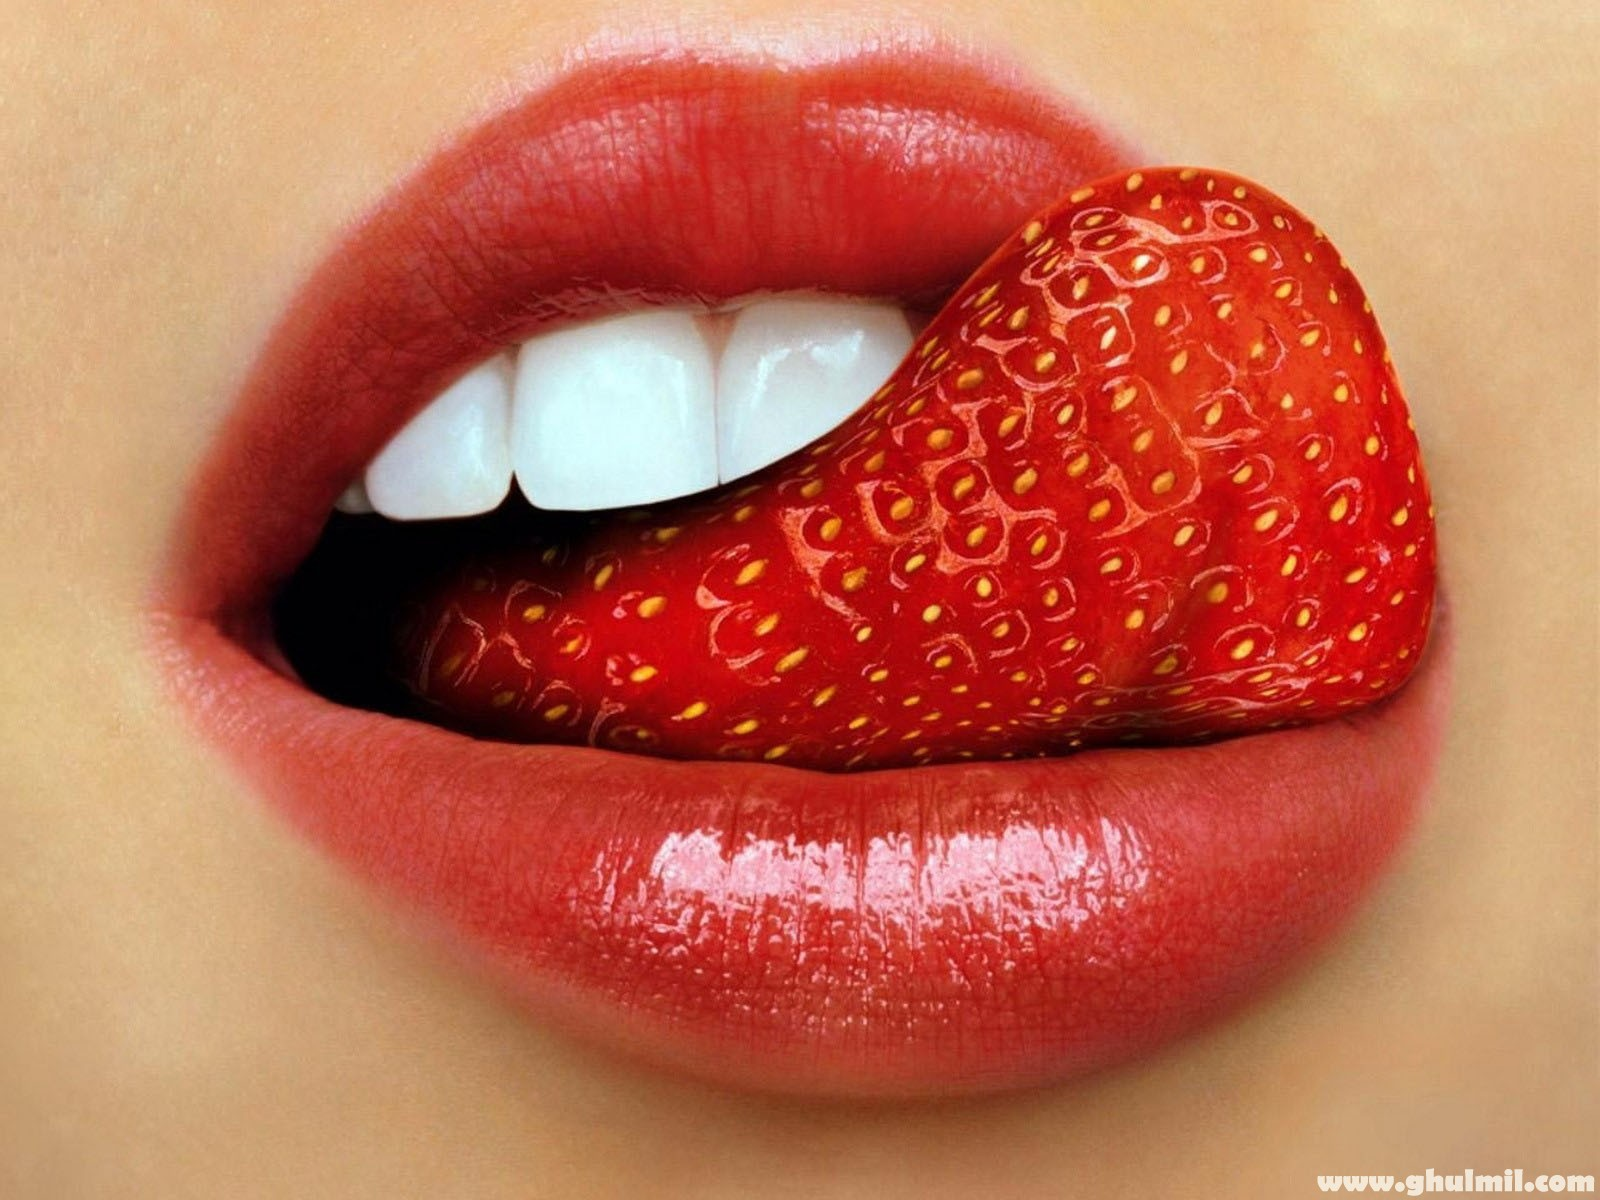 http://4.bp.blogspot.com/_yrK5_kaJFzg/TRTnqH69QnI/AAAAAAAAAFk/nDtlXPWlLuo/s1600/Very+Beautiful+Sexy+Strawberry+Tongue+Lips+Wallpaper+For+Desktops+Computers.jpg